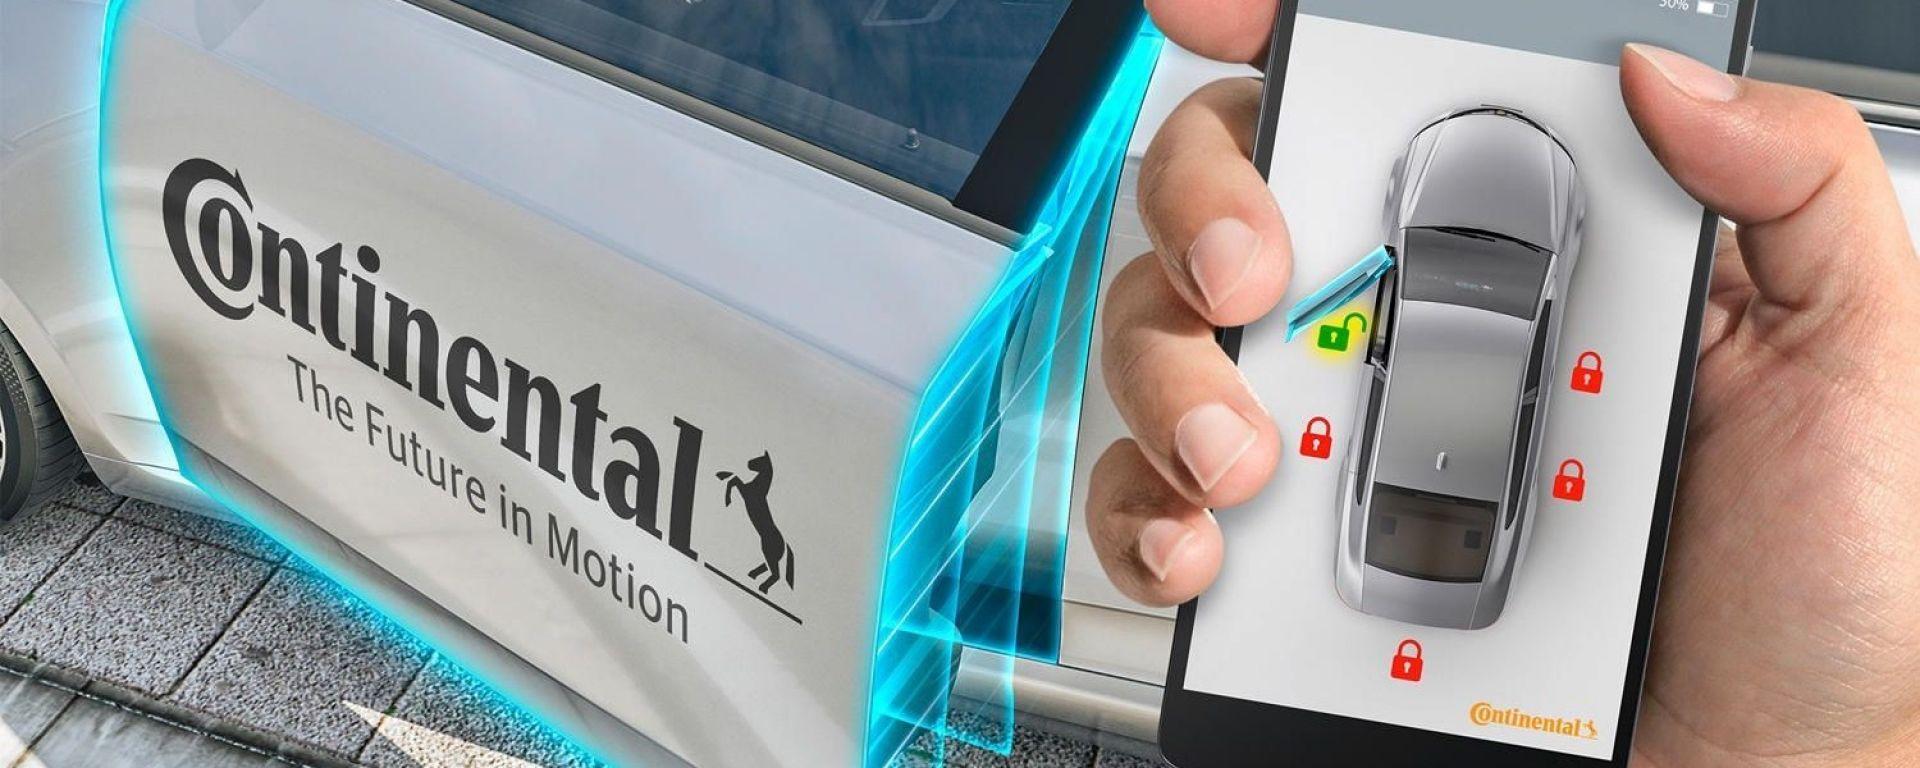 Avis: la tecnologia Continental Key as a Service